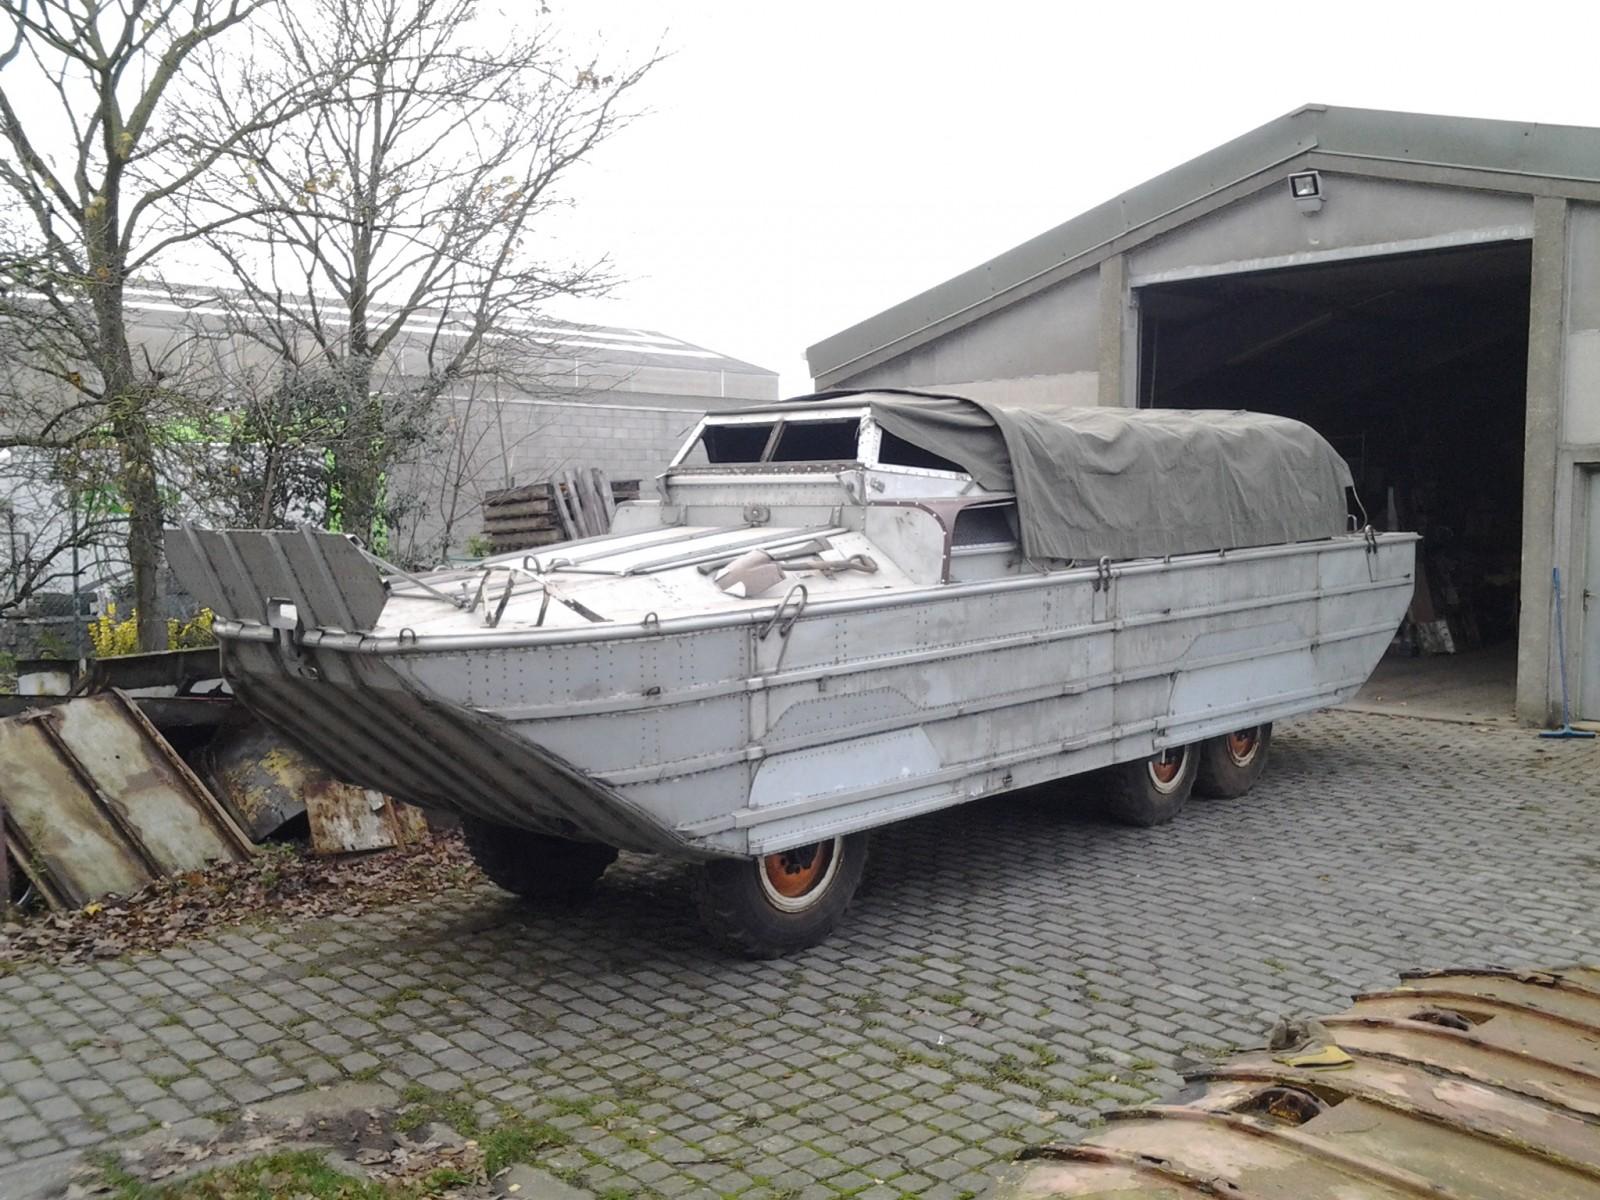 Amphibious Vehicle For Sale >> Dry Docked Duck: DUKW Amphibious Vehicle